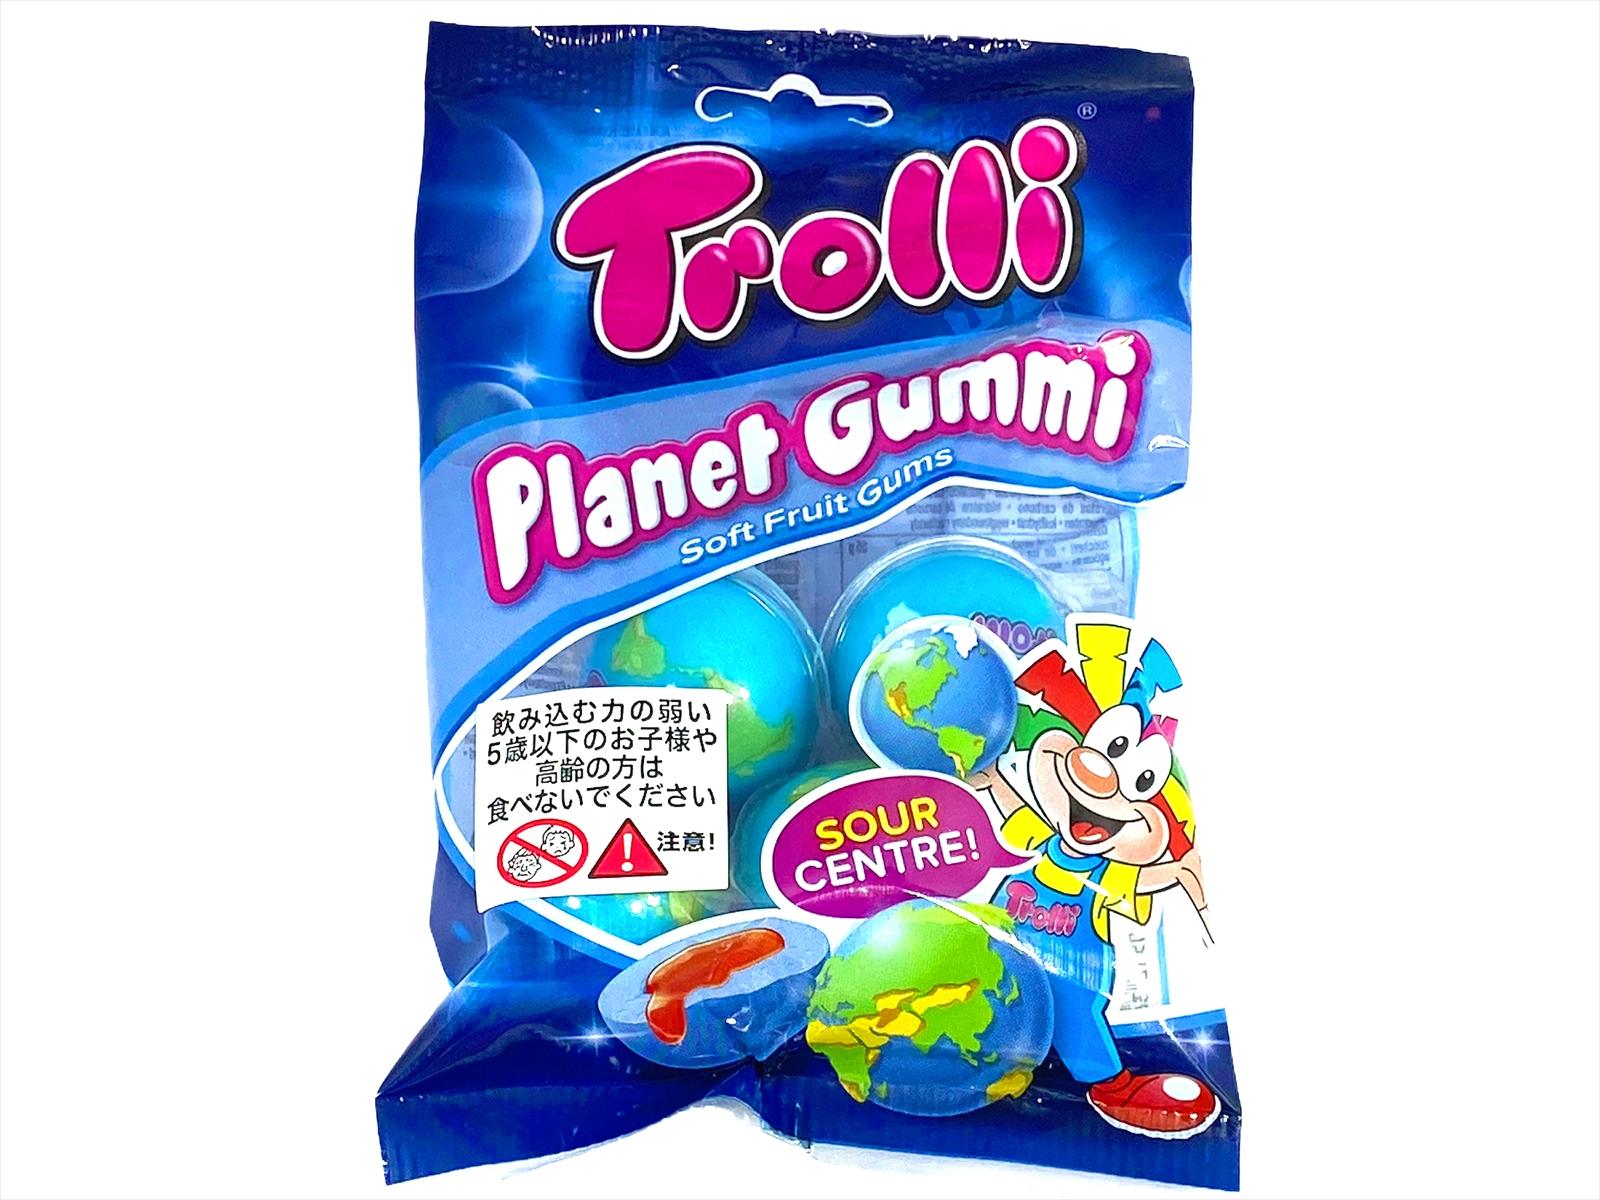 Trolli Planet Gummi Soft Fruit Gums. 日本に輸入されるのはスペインバージョン。